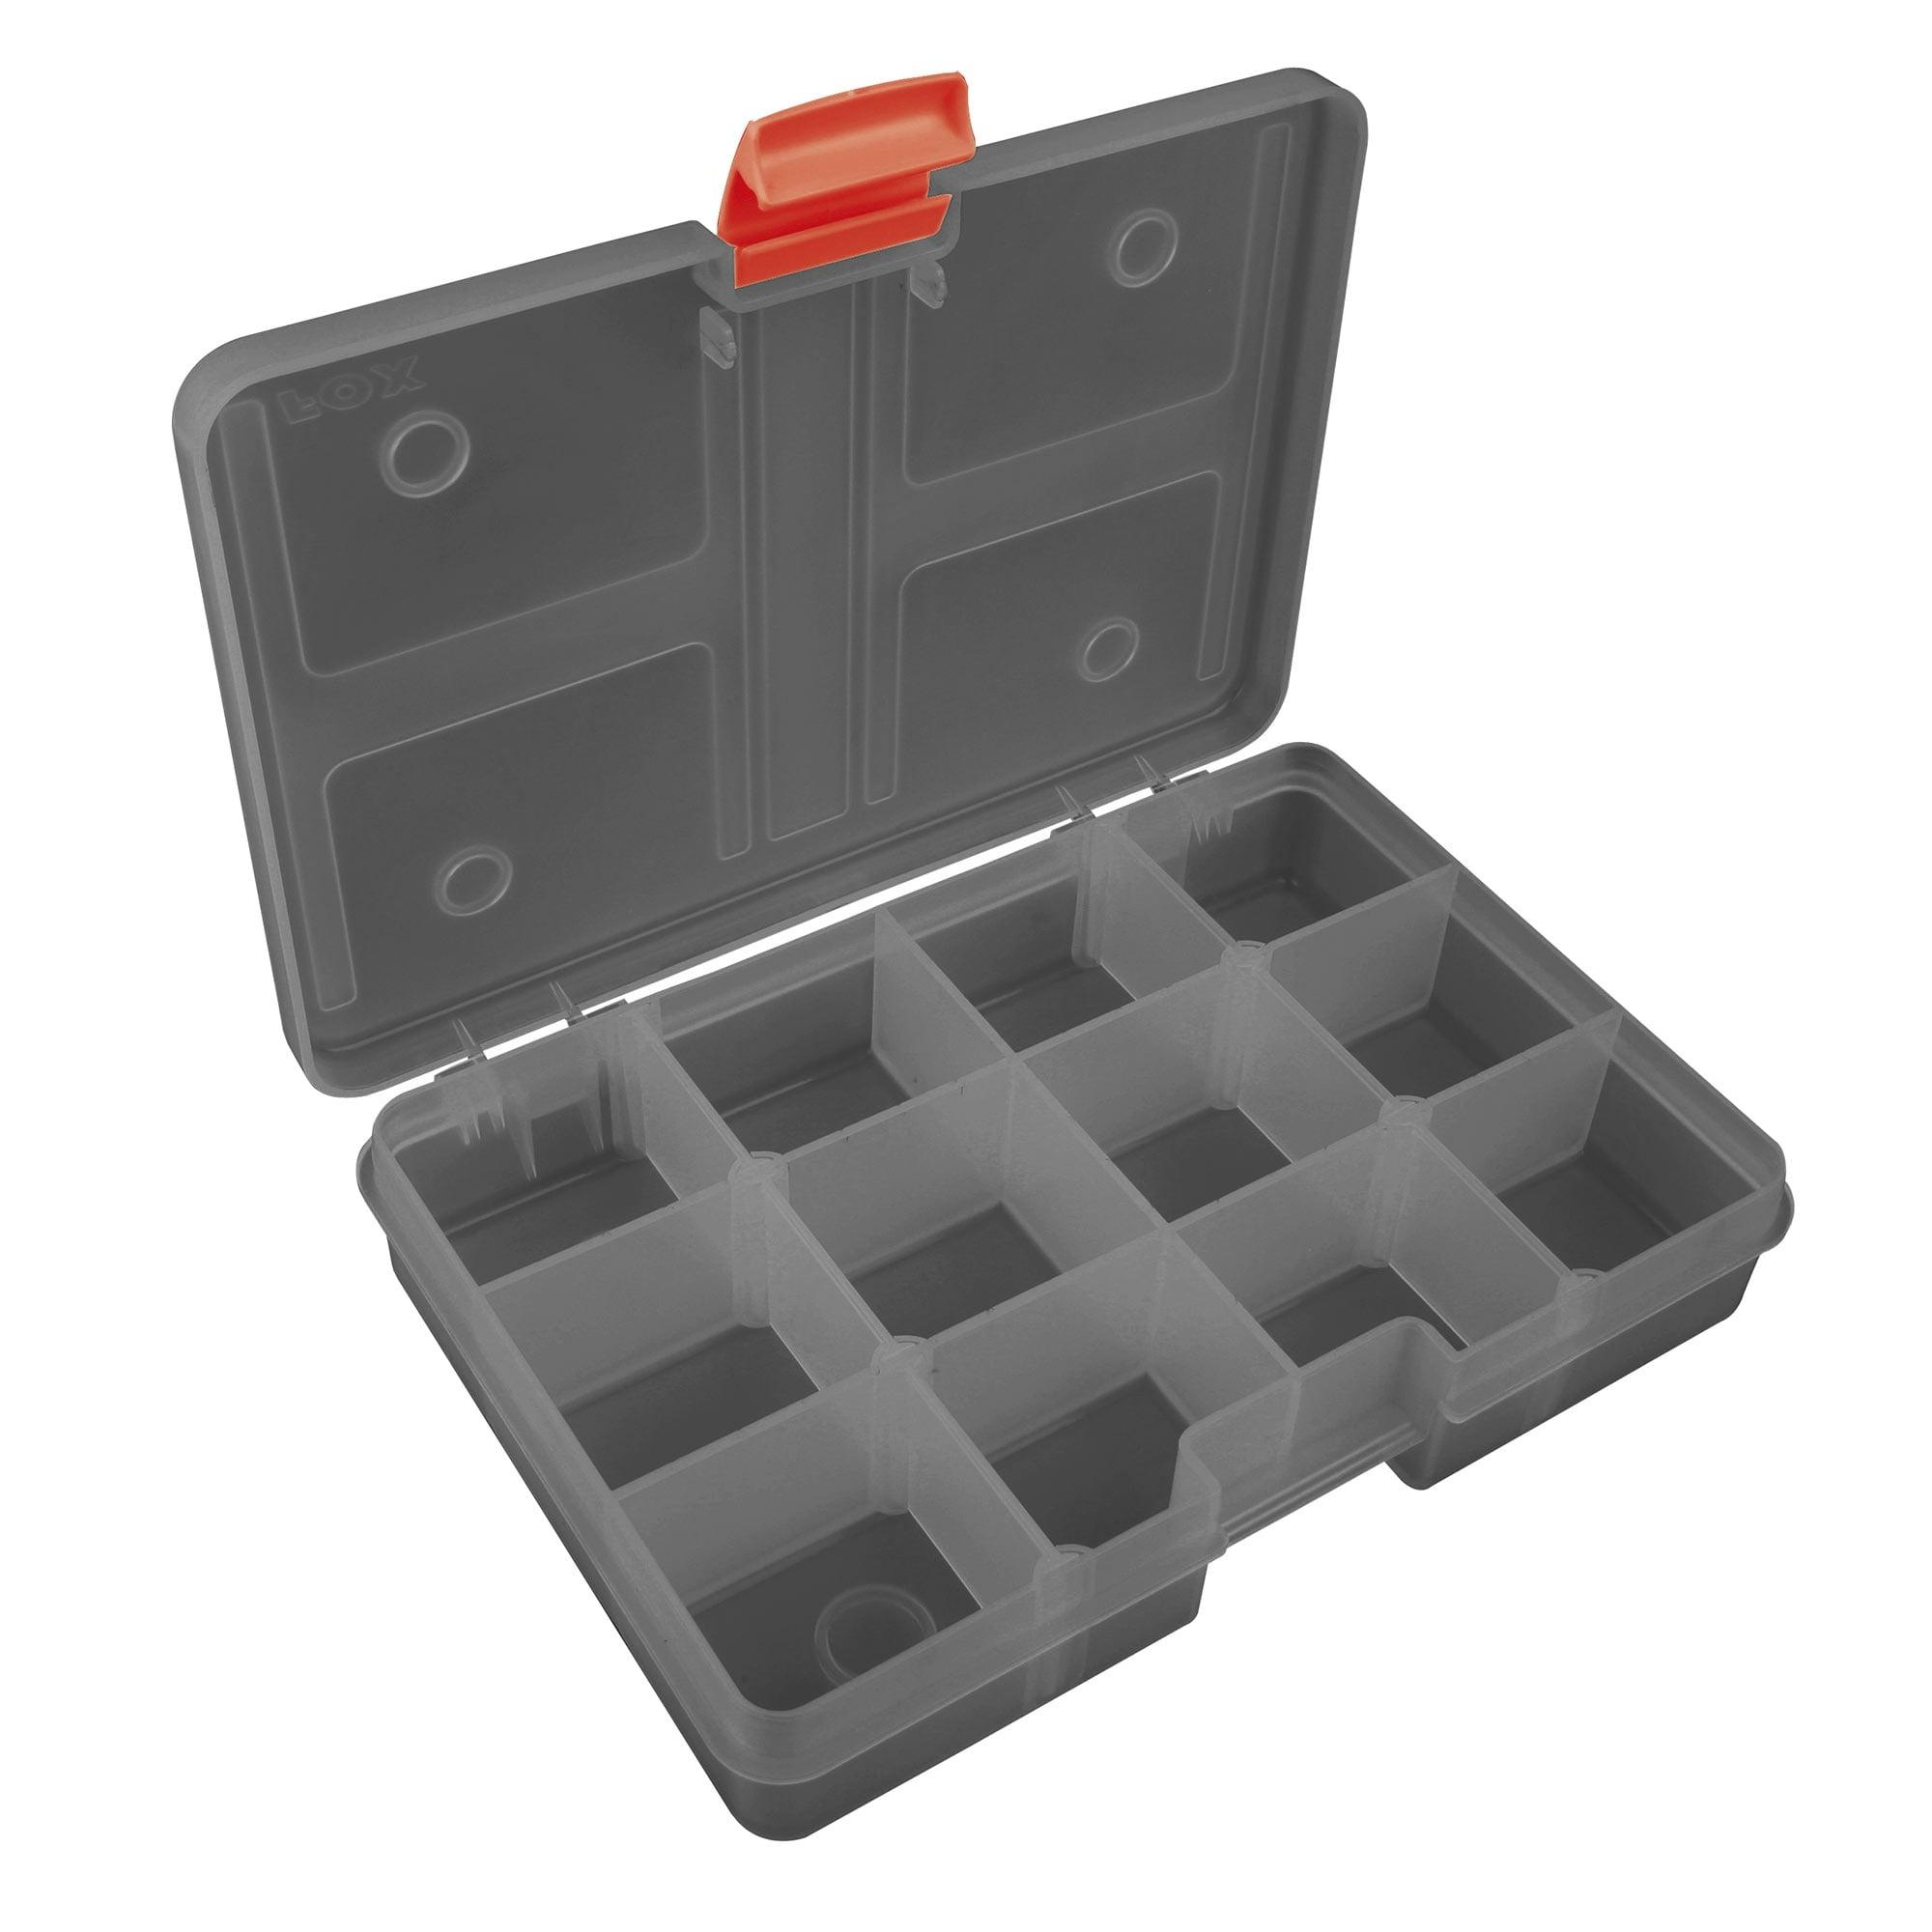 Box Store FOX Rage 12 scomporati Small ( 22x15 x h 4cm)